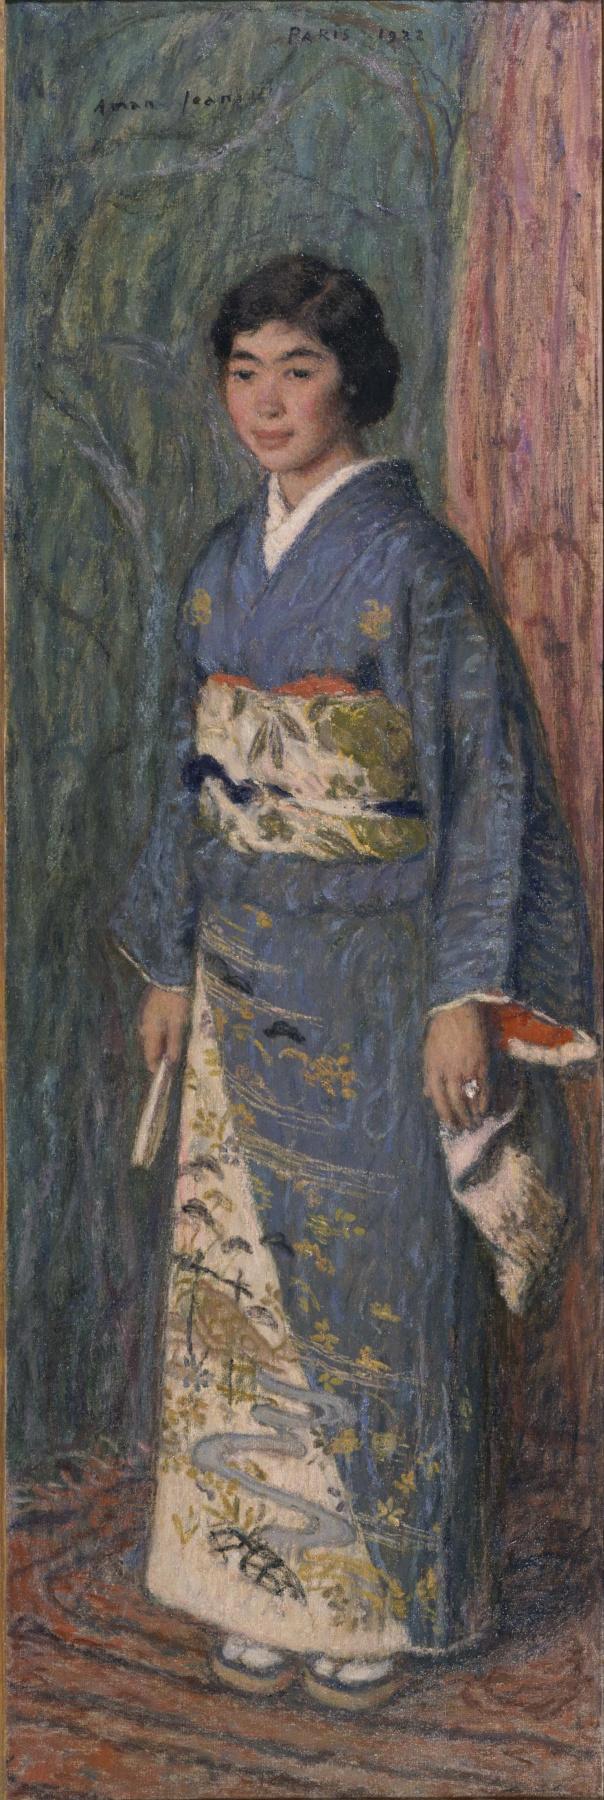 Эдмон Франсуа Аман-Жан. Портрет госпожи Такеко Куроки